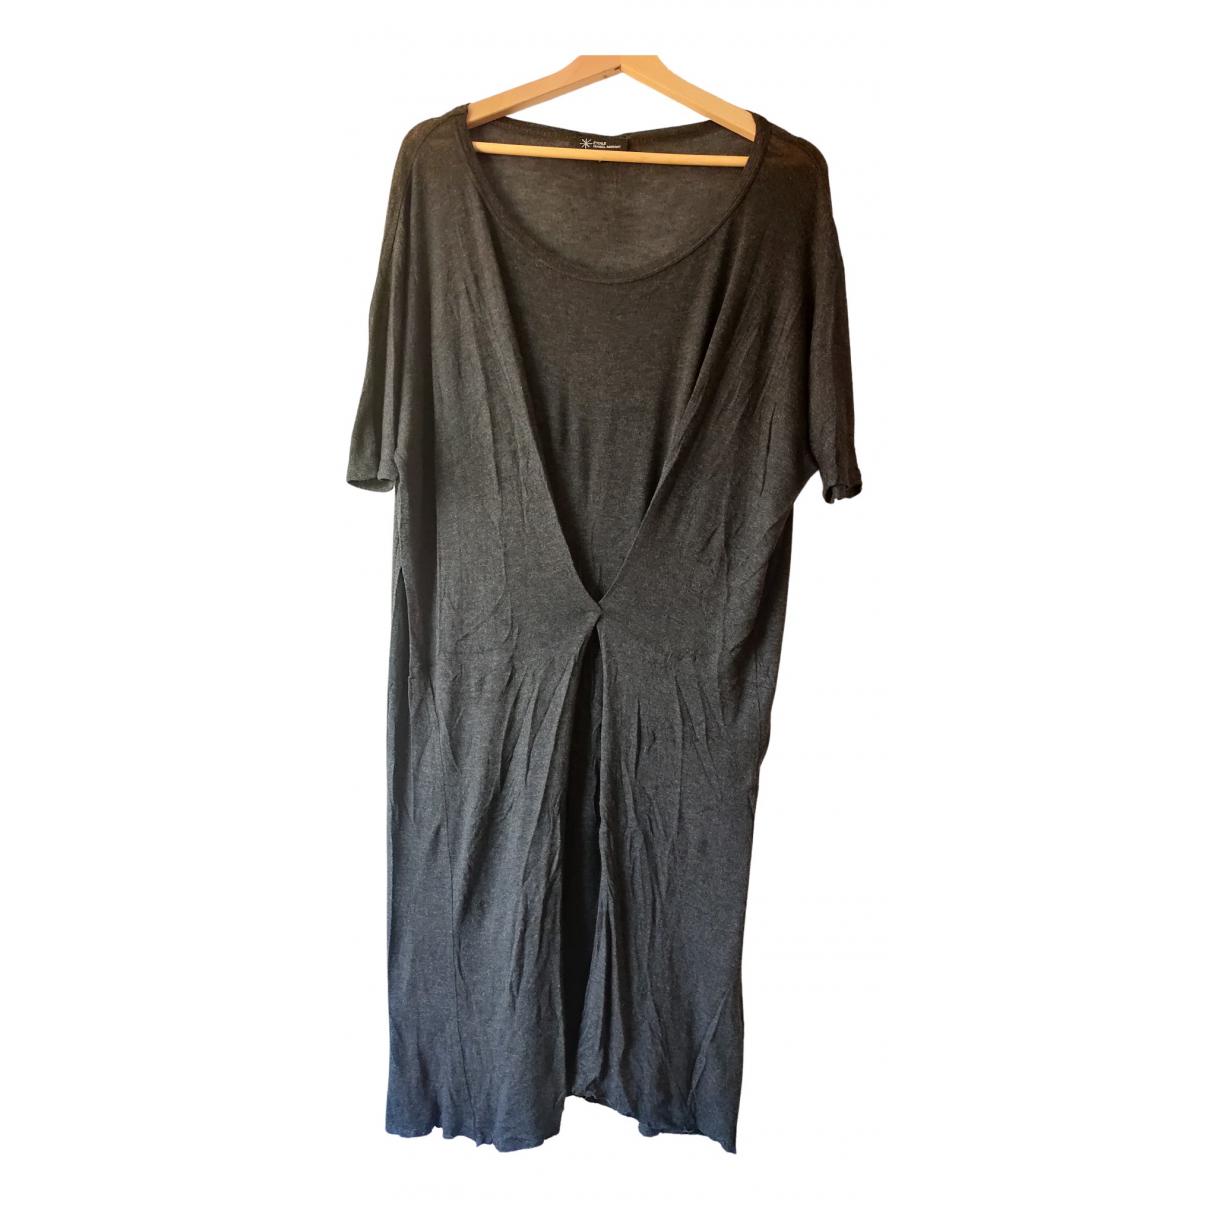 Isabel Marant Etoile \N Kleid in  Anthrazit Baumwolle - Elasthan